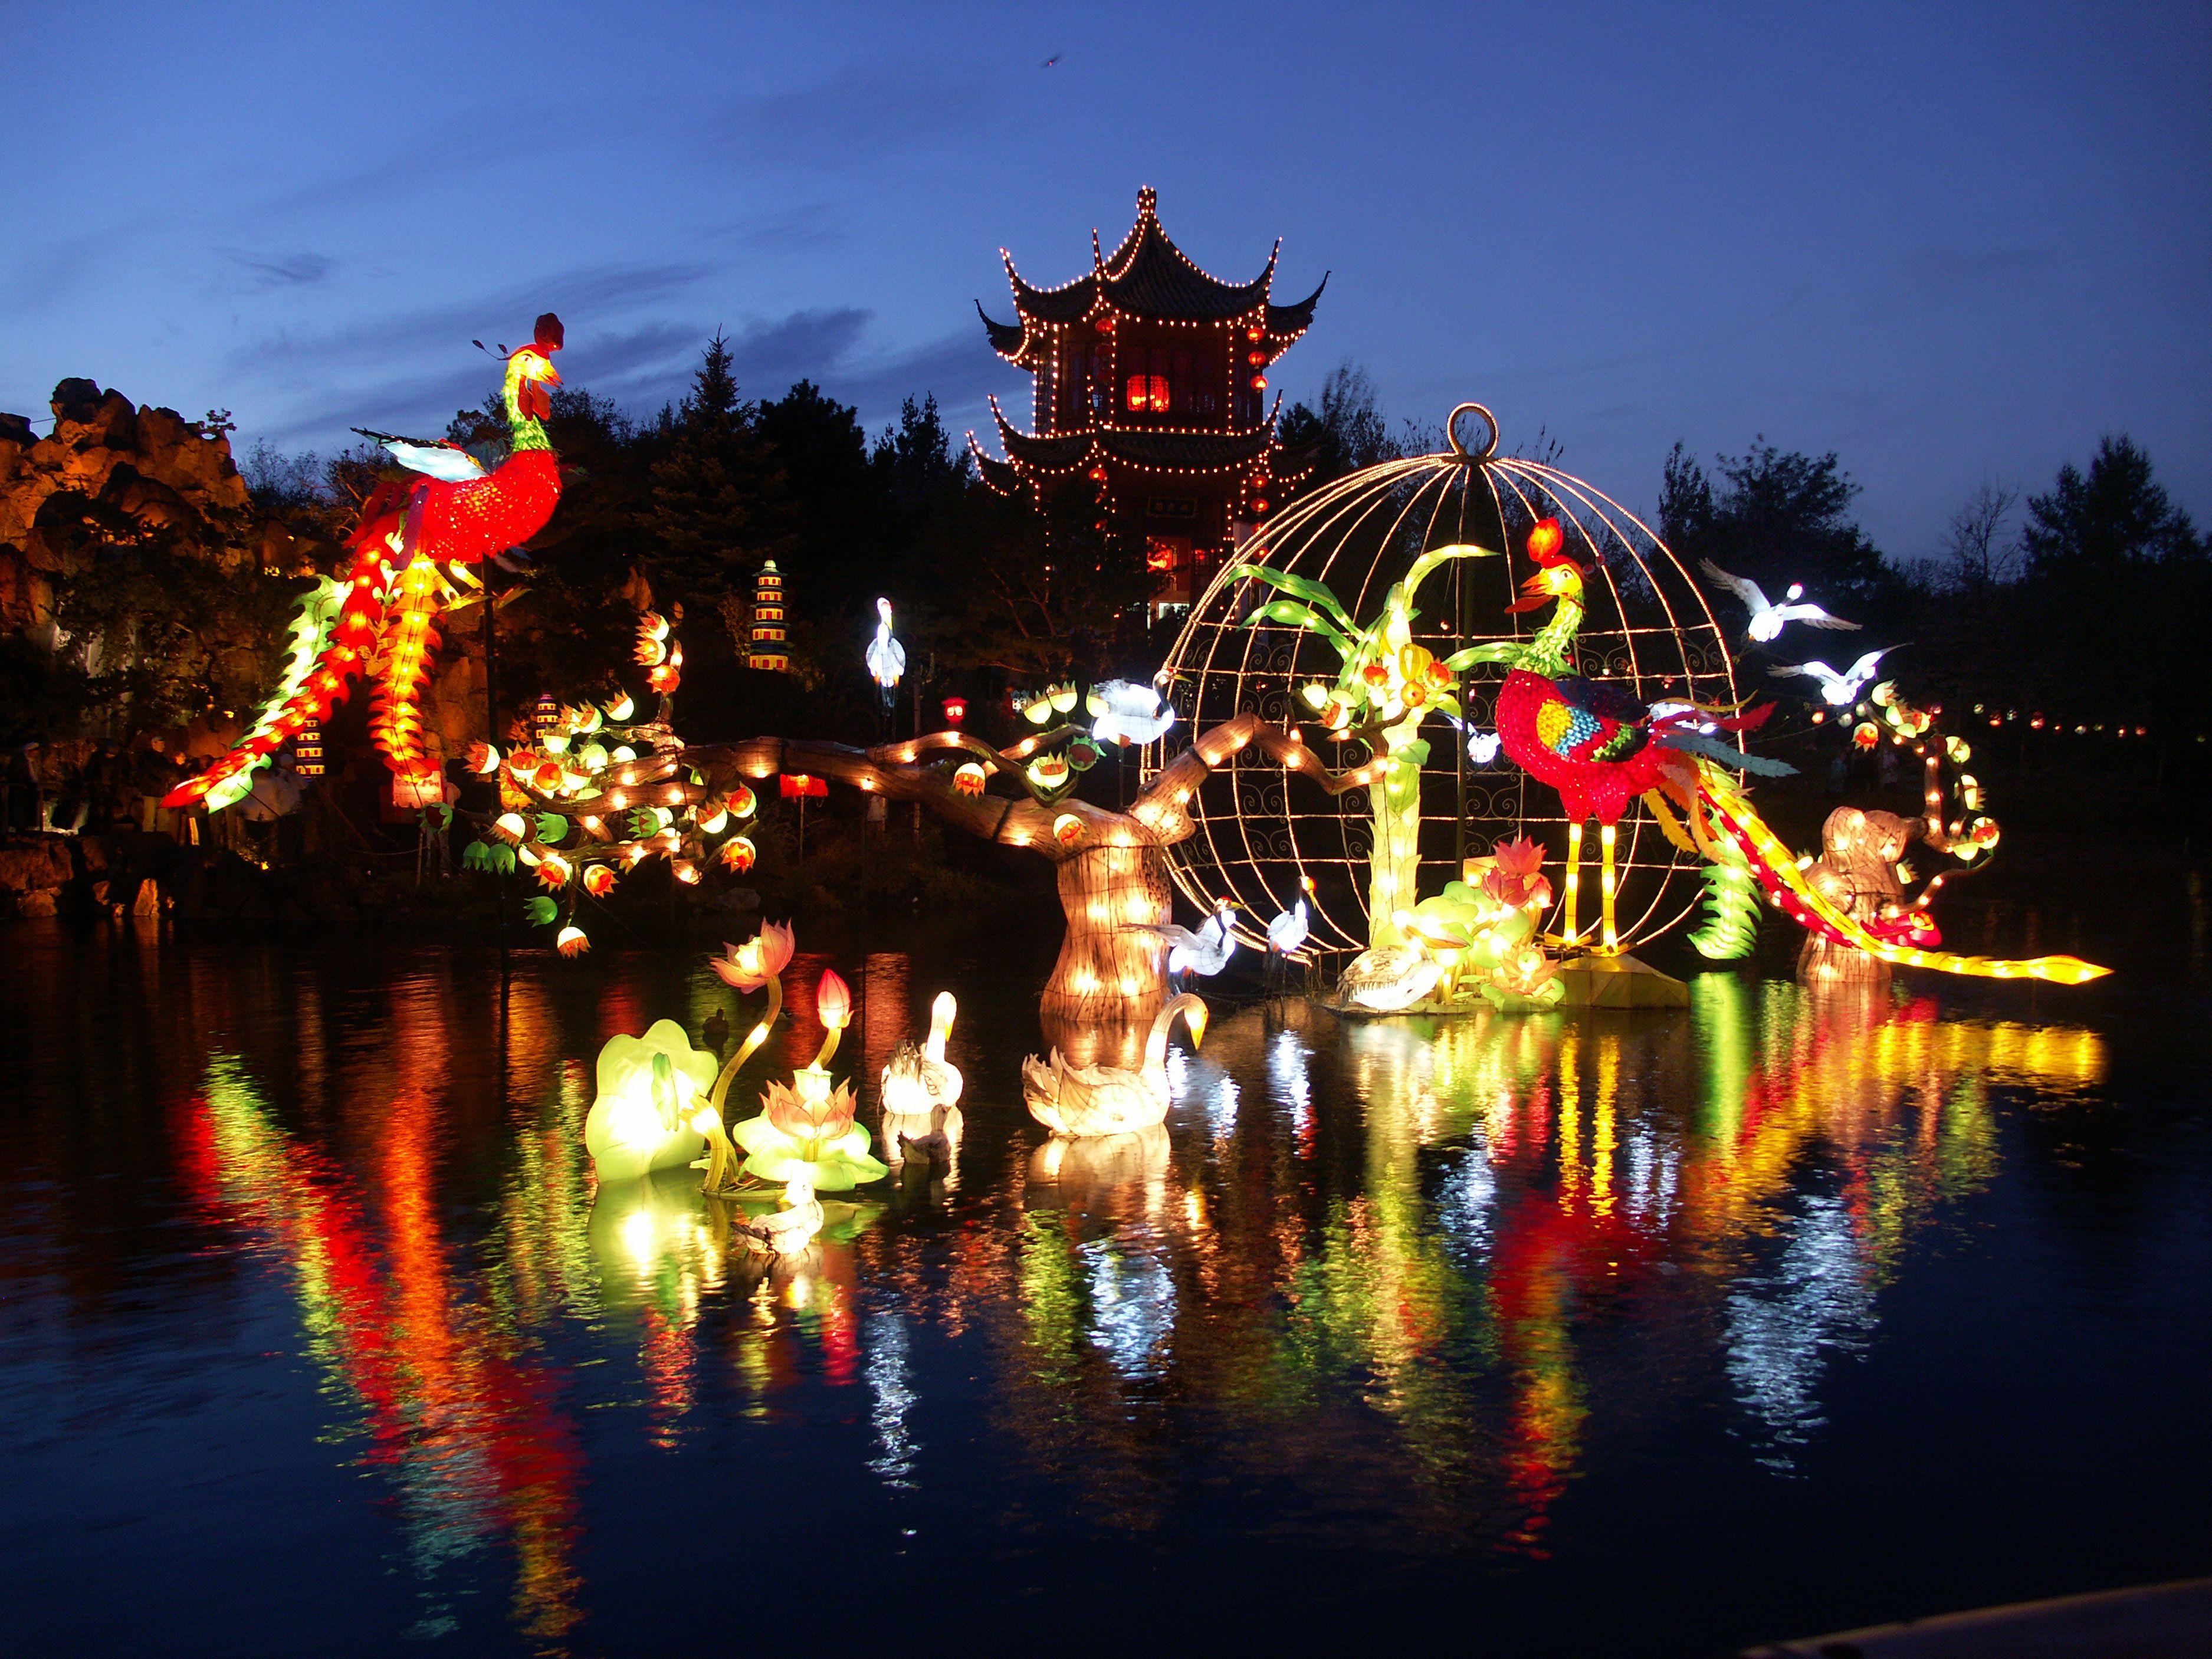 Gardens of Lights at Montreal Botanic Garden